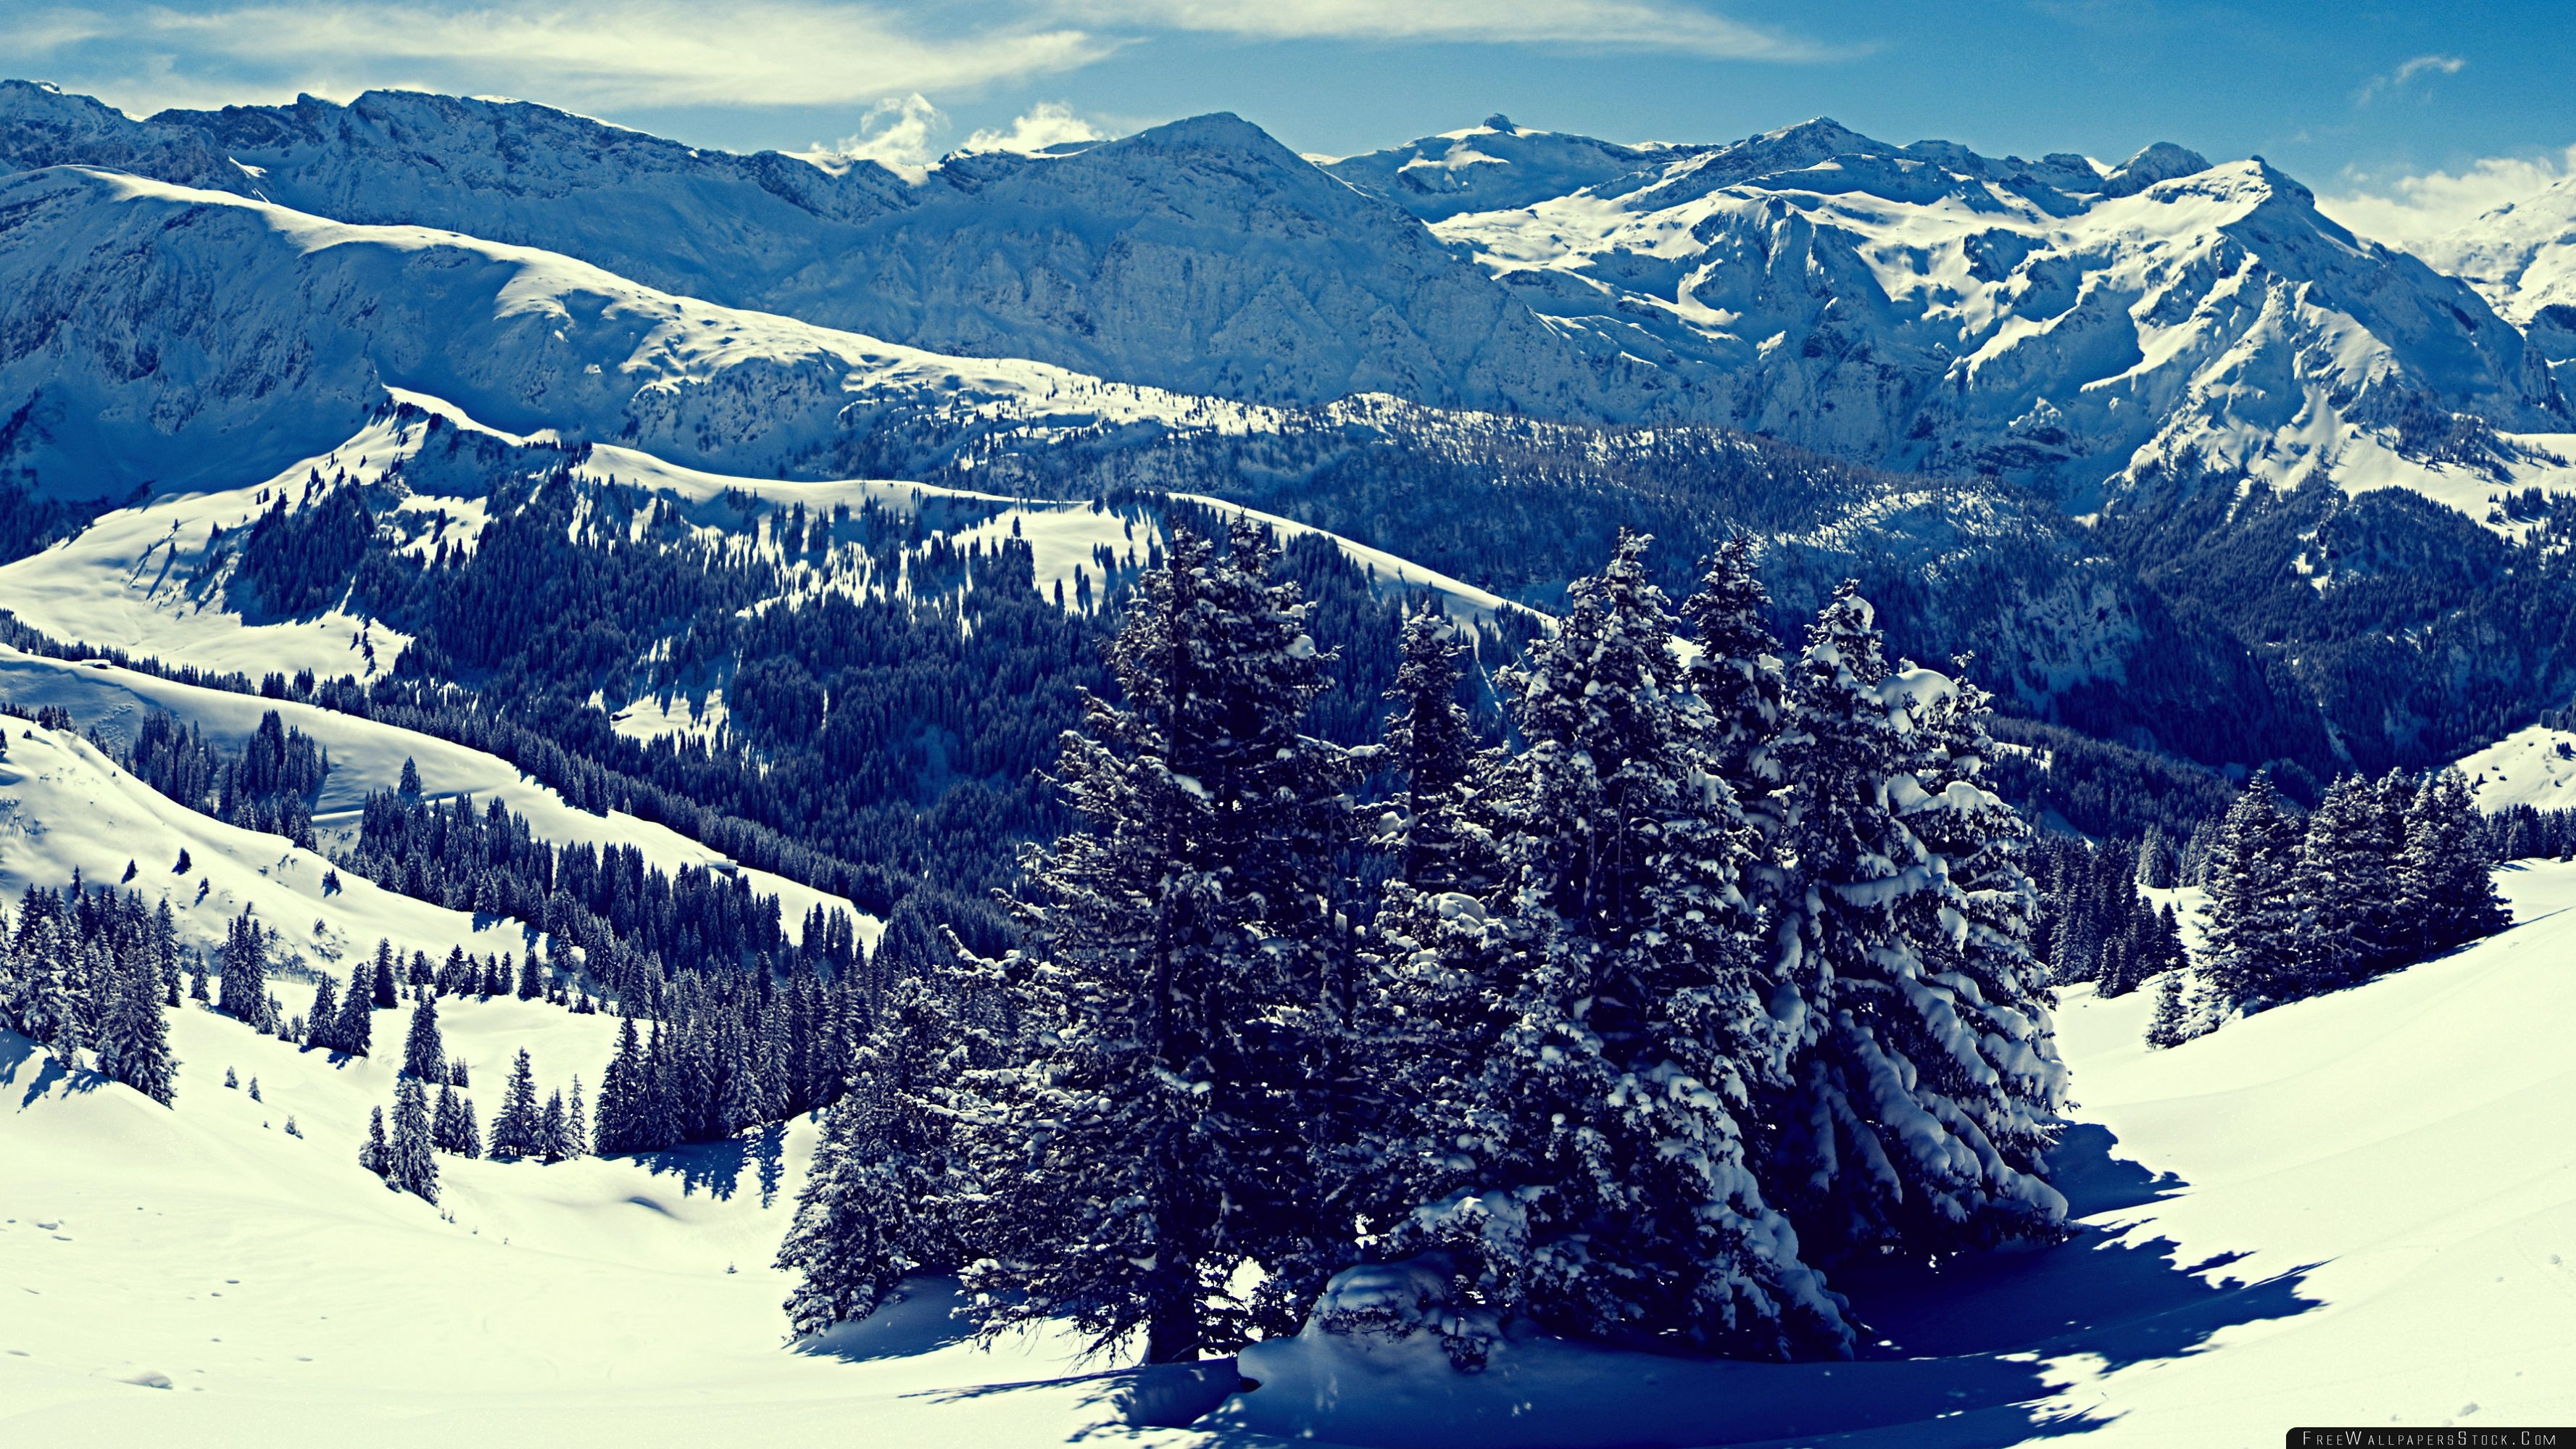 Download Free Wallpaper Winter Mountain Landscape